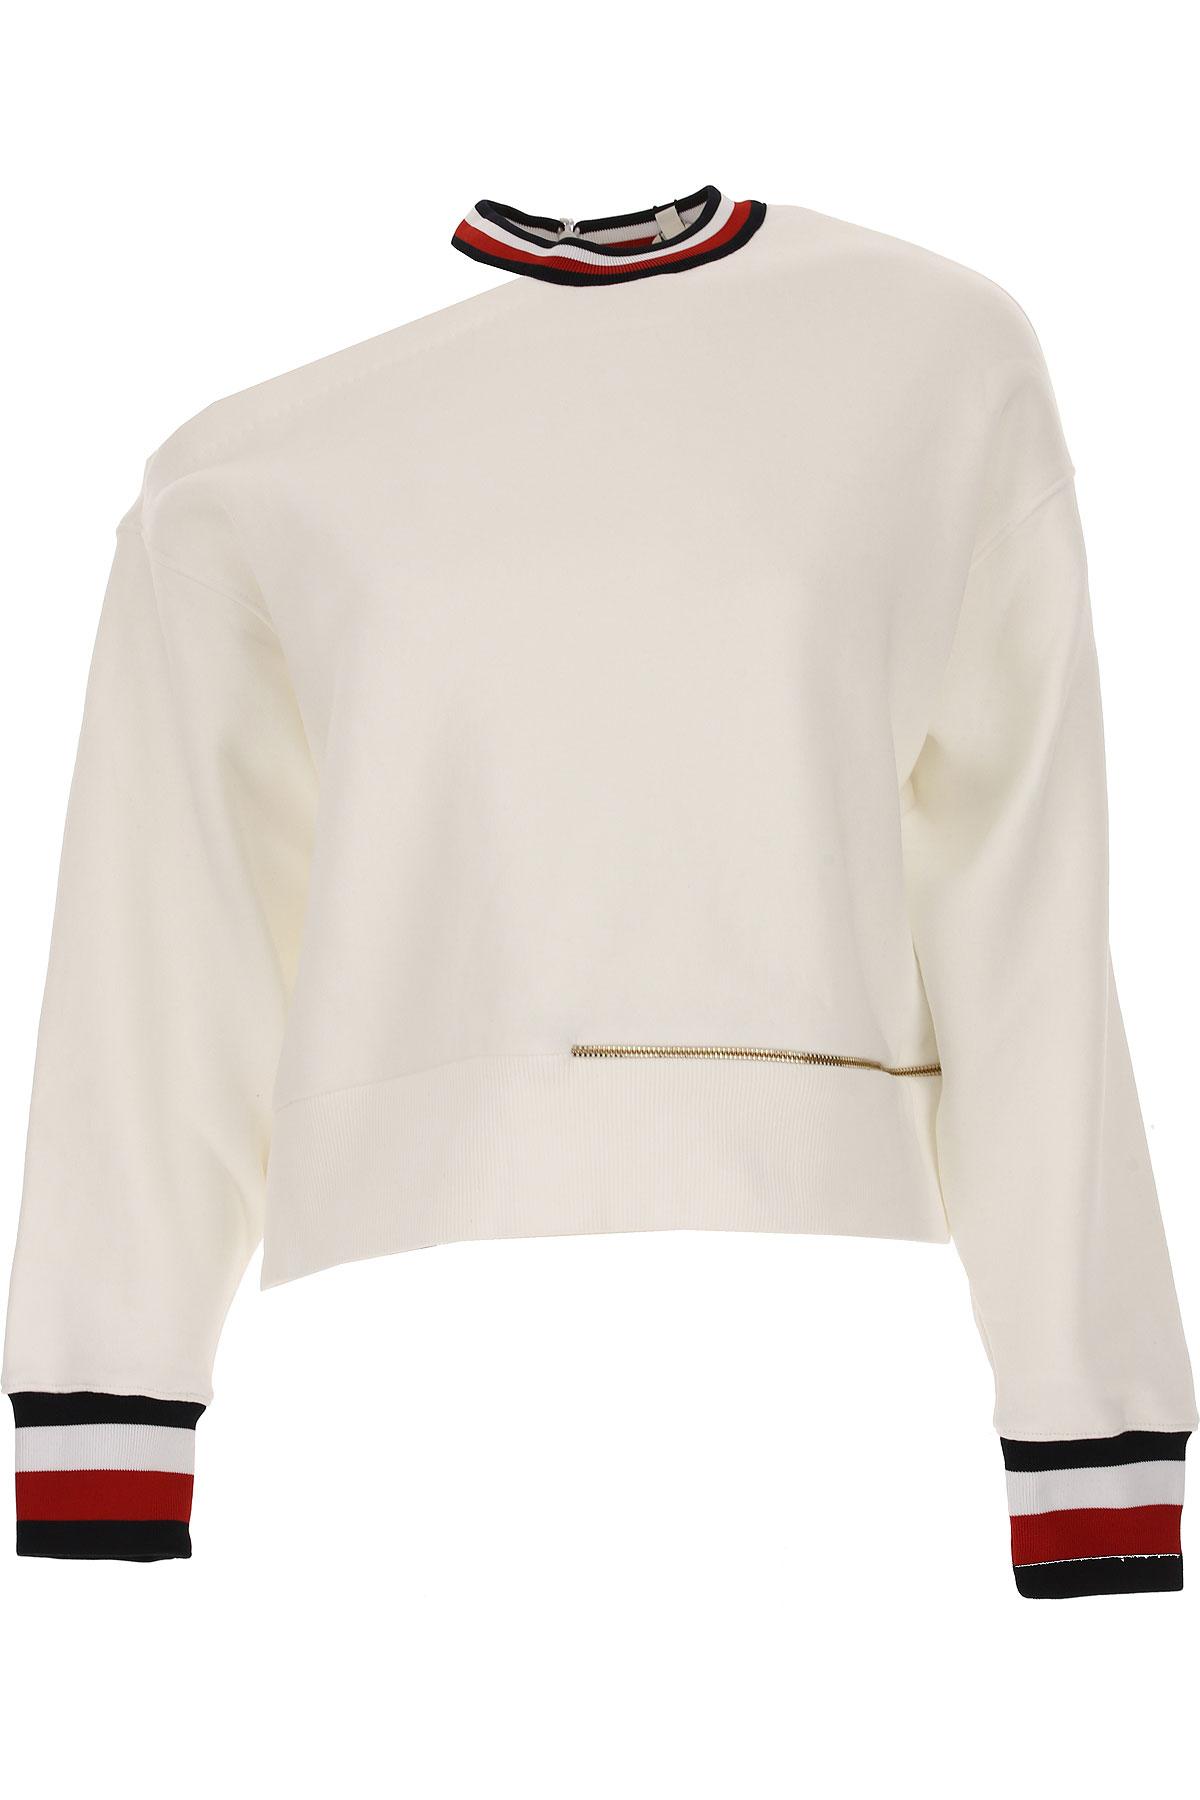 Tommy Hilfiger Sweatshirt for Women, White, Cotton, 2017, 2 4 8 USA-448861